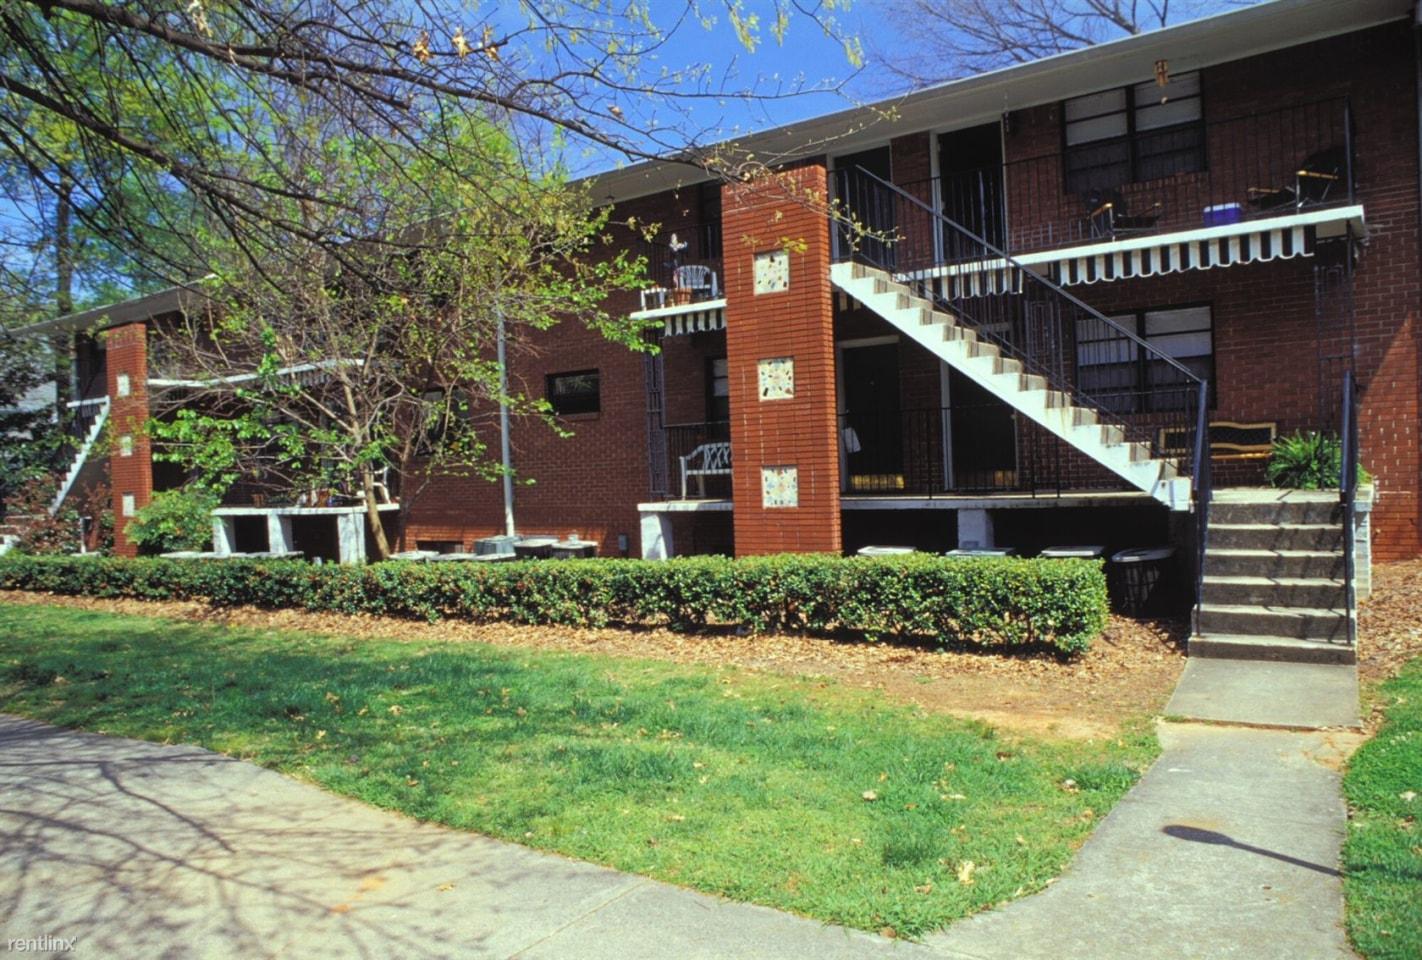 Image of Myrtle Street Apartments at 921 Myrtle St NE Atlanta GA